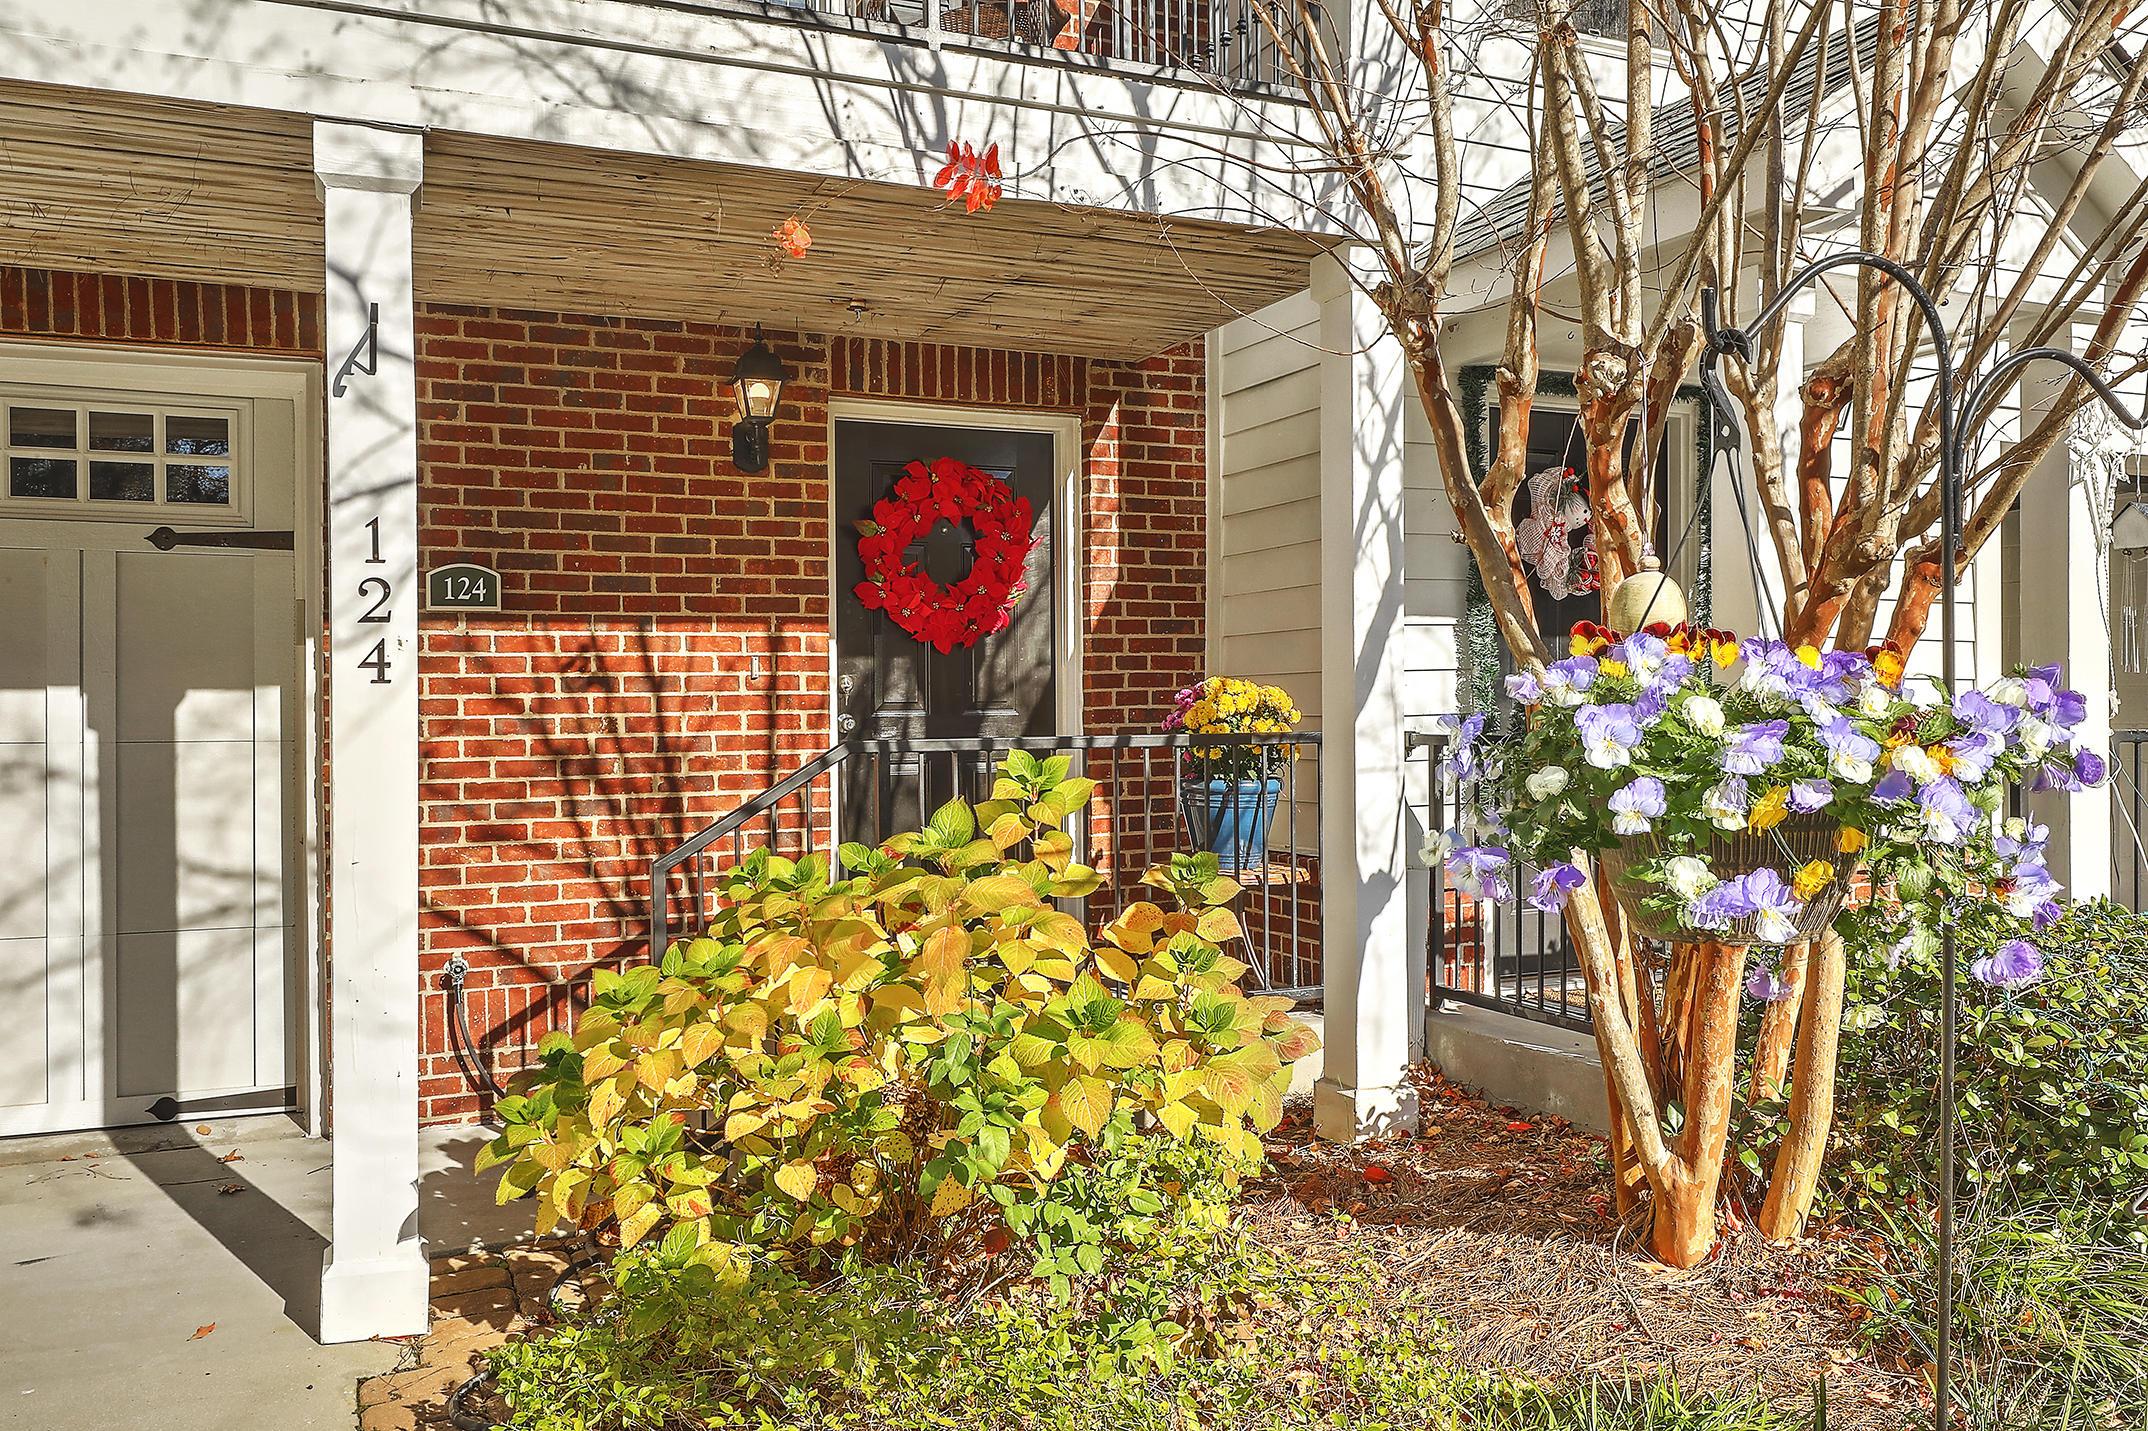 Etiwan Pointe Homes For Sale - 124 Winding Creek, Mount Pleasant, SC - 8